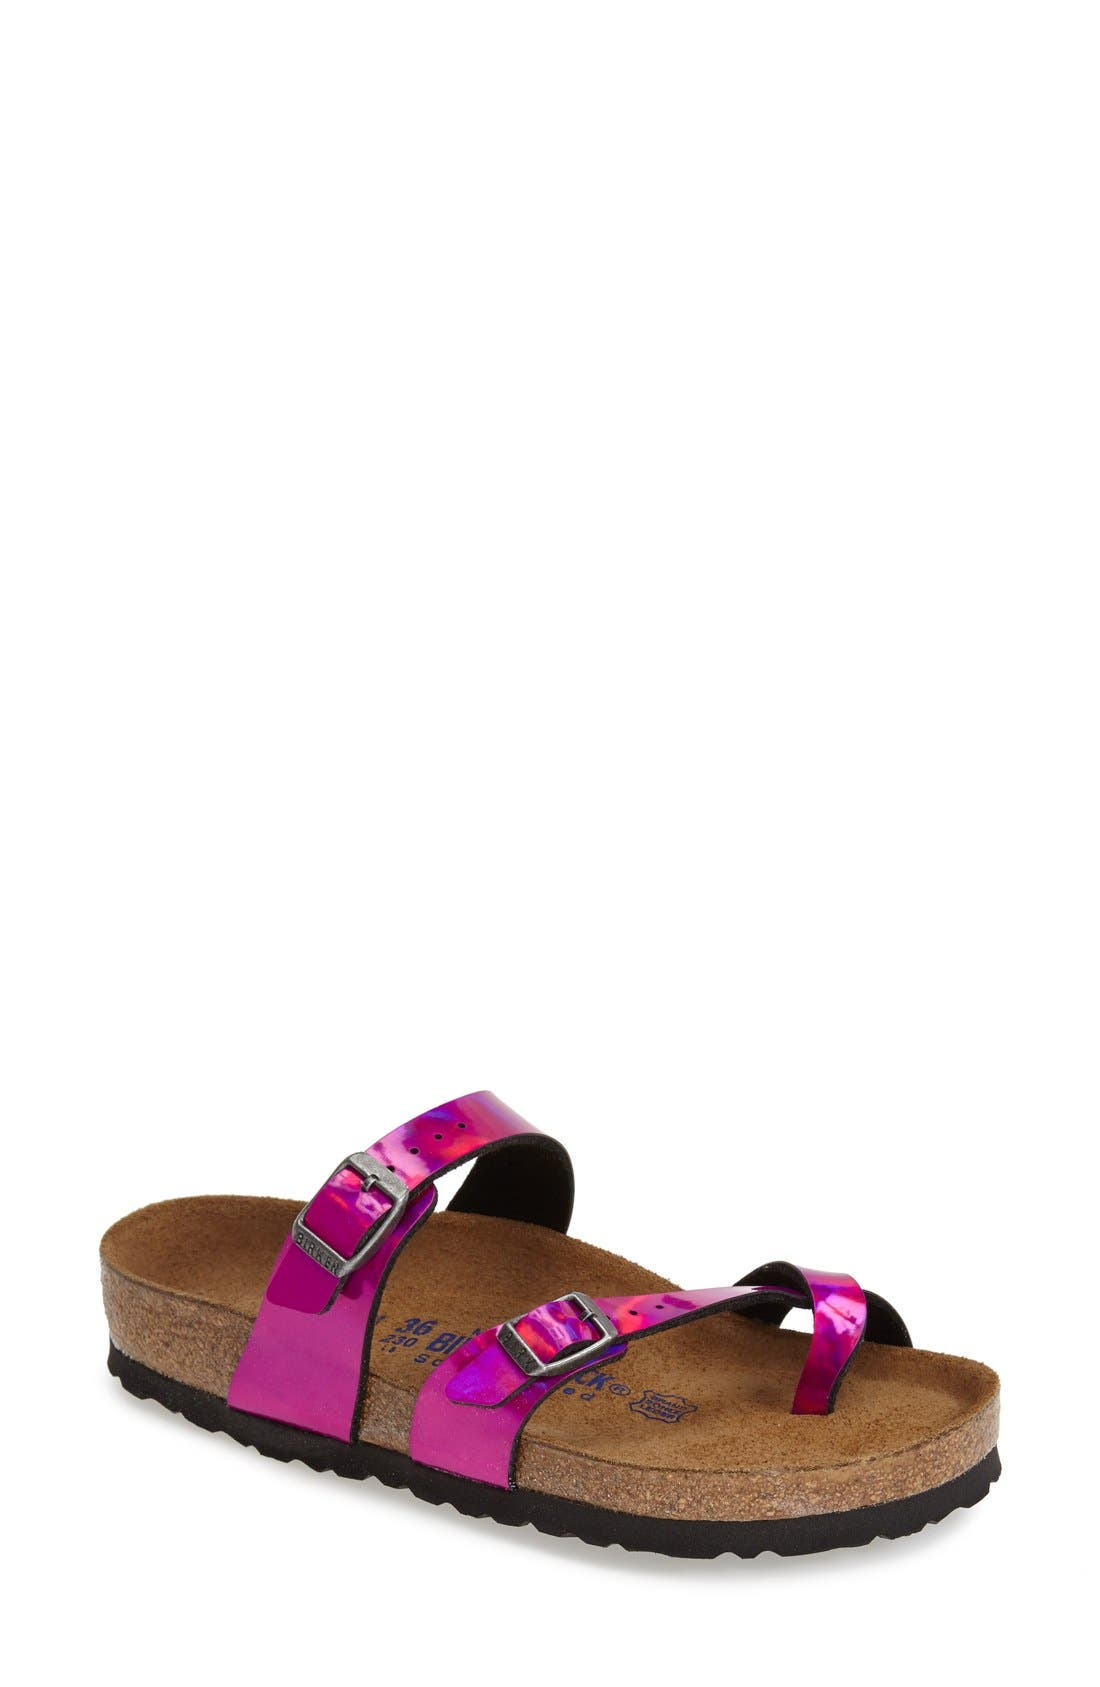 Main Image - Birkenstock 'Mayari' Birko-Flor™ Sandal (Women)